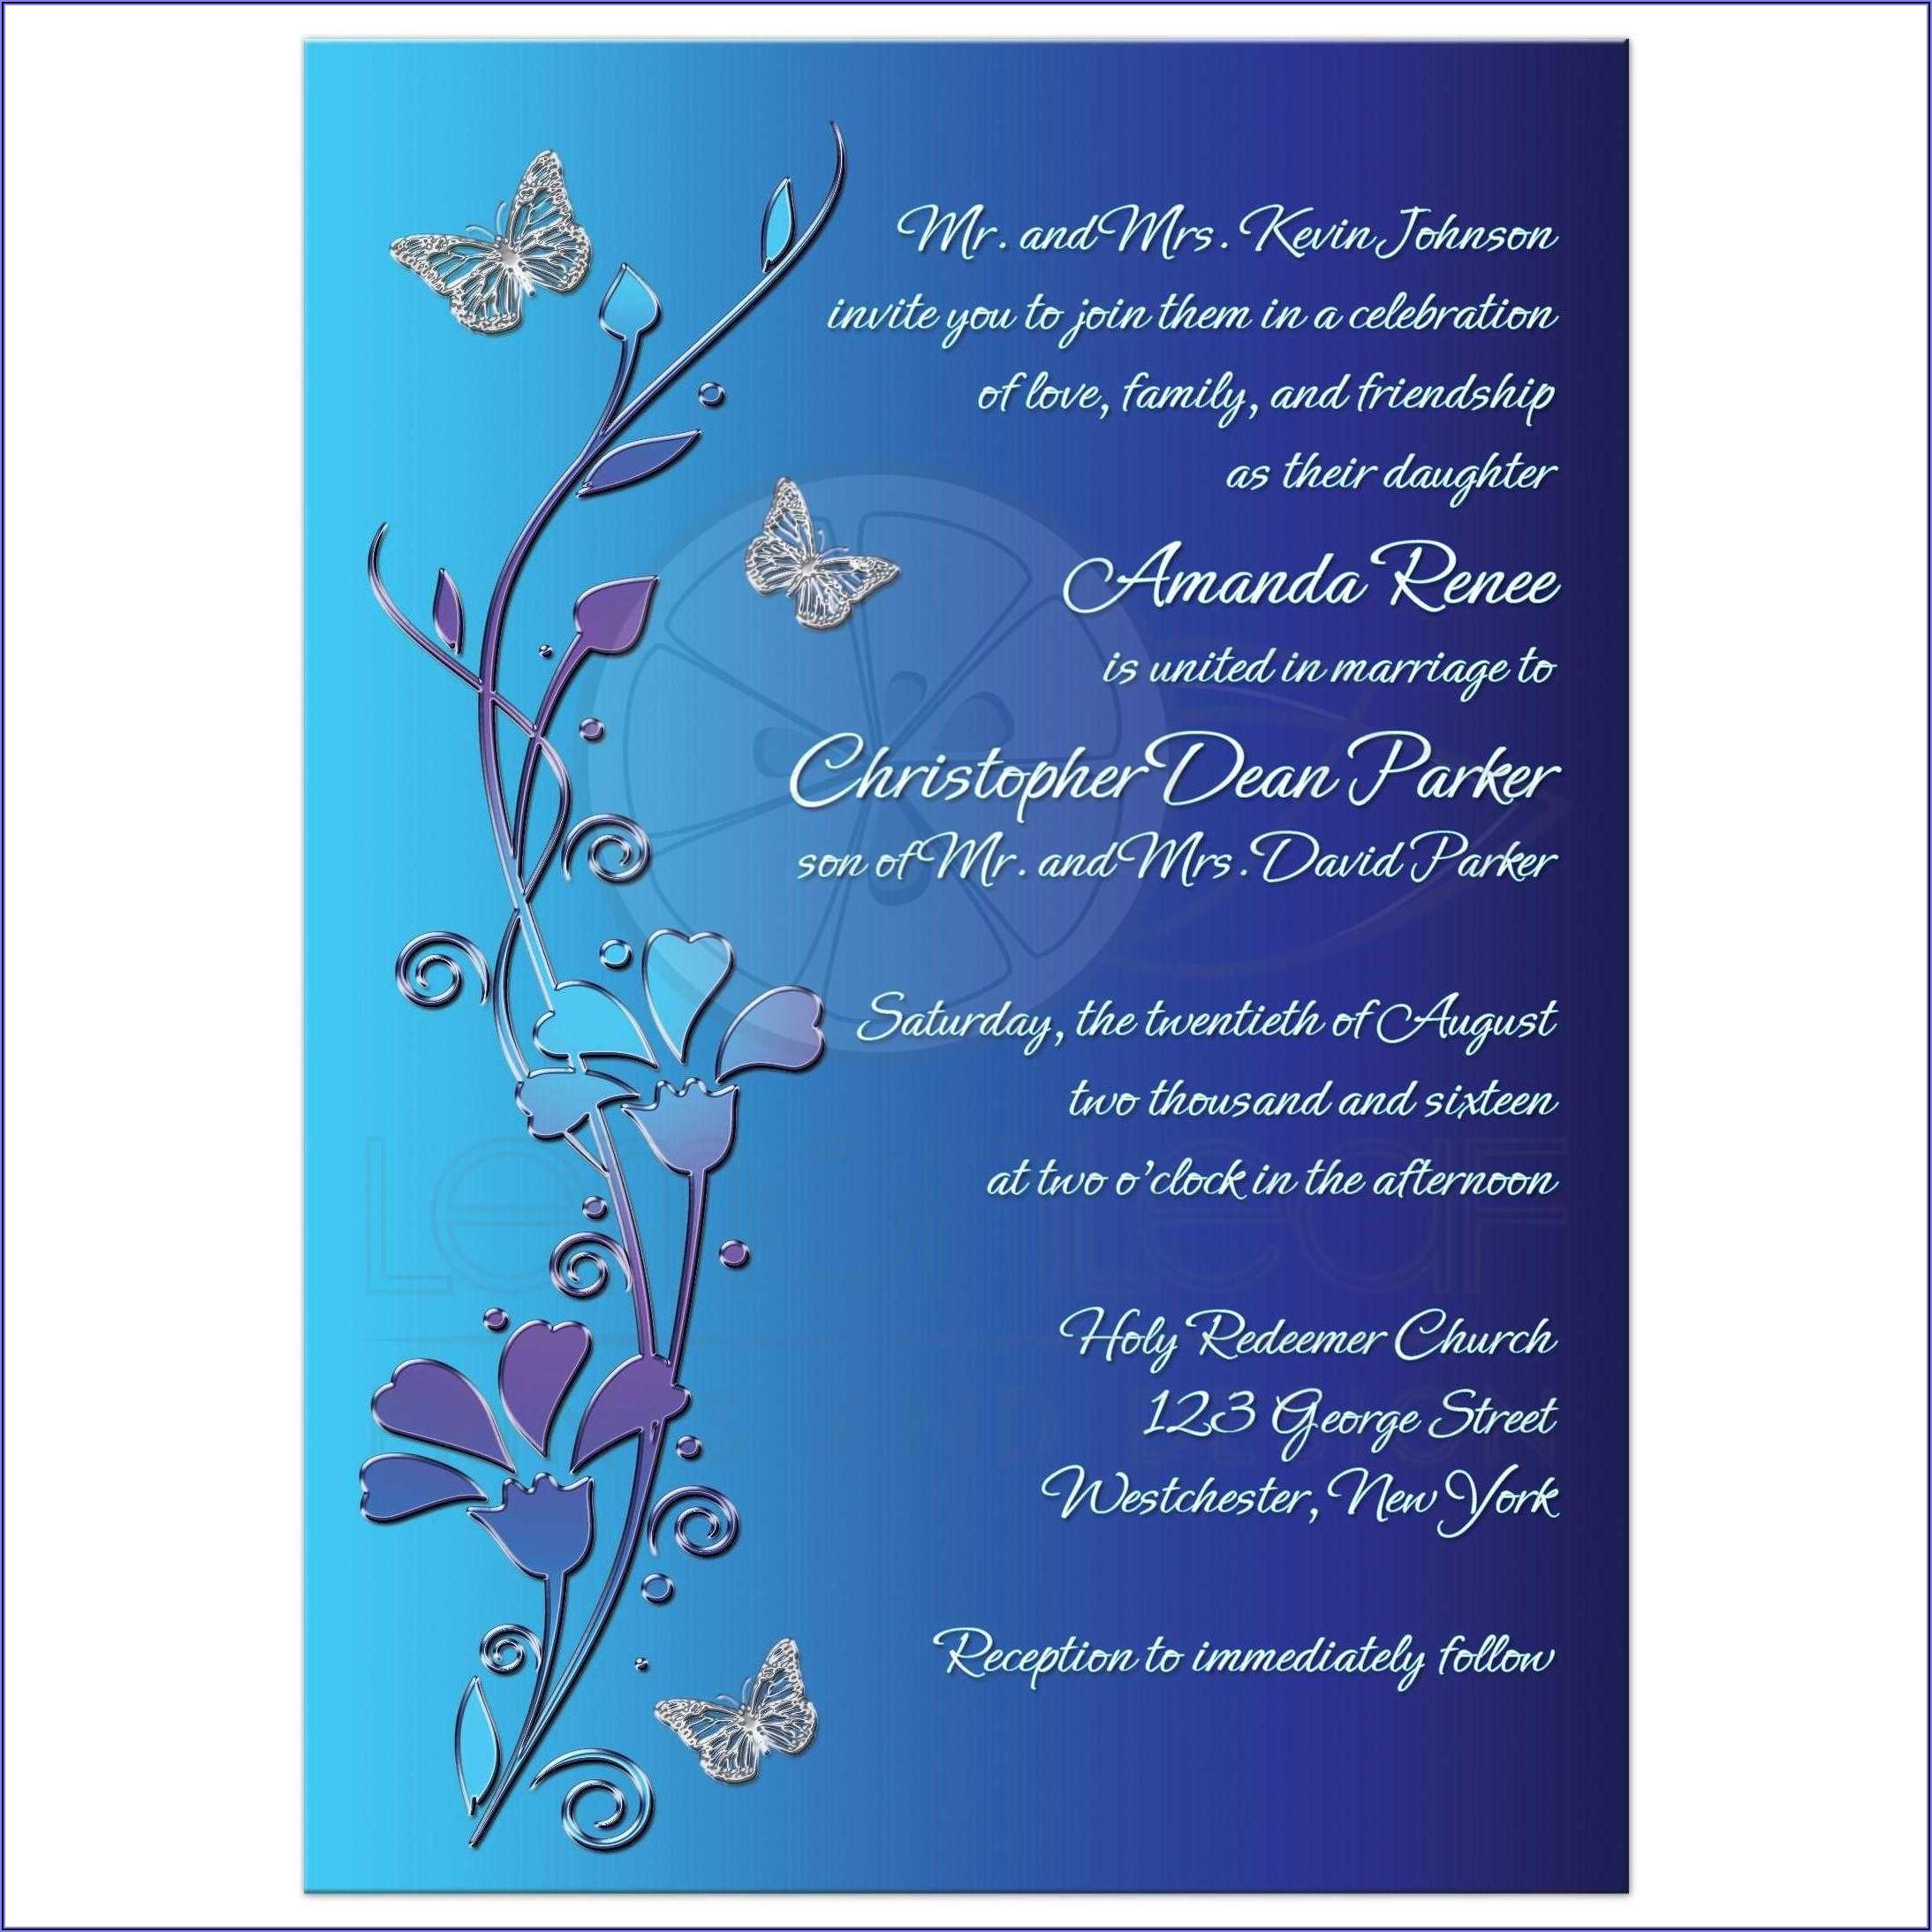 Royal Blue Wedding Invitation Background Designs Free Download